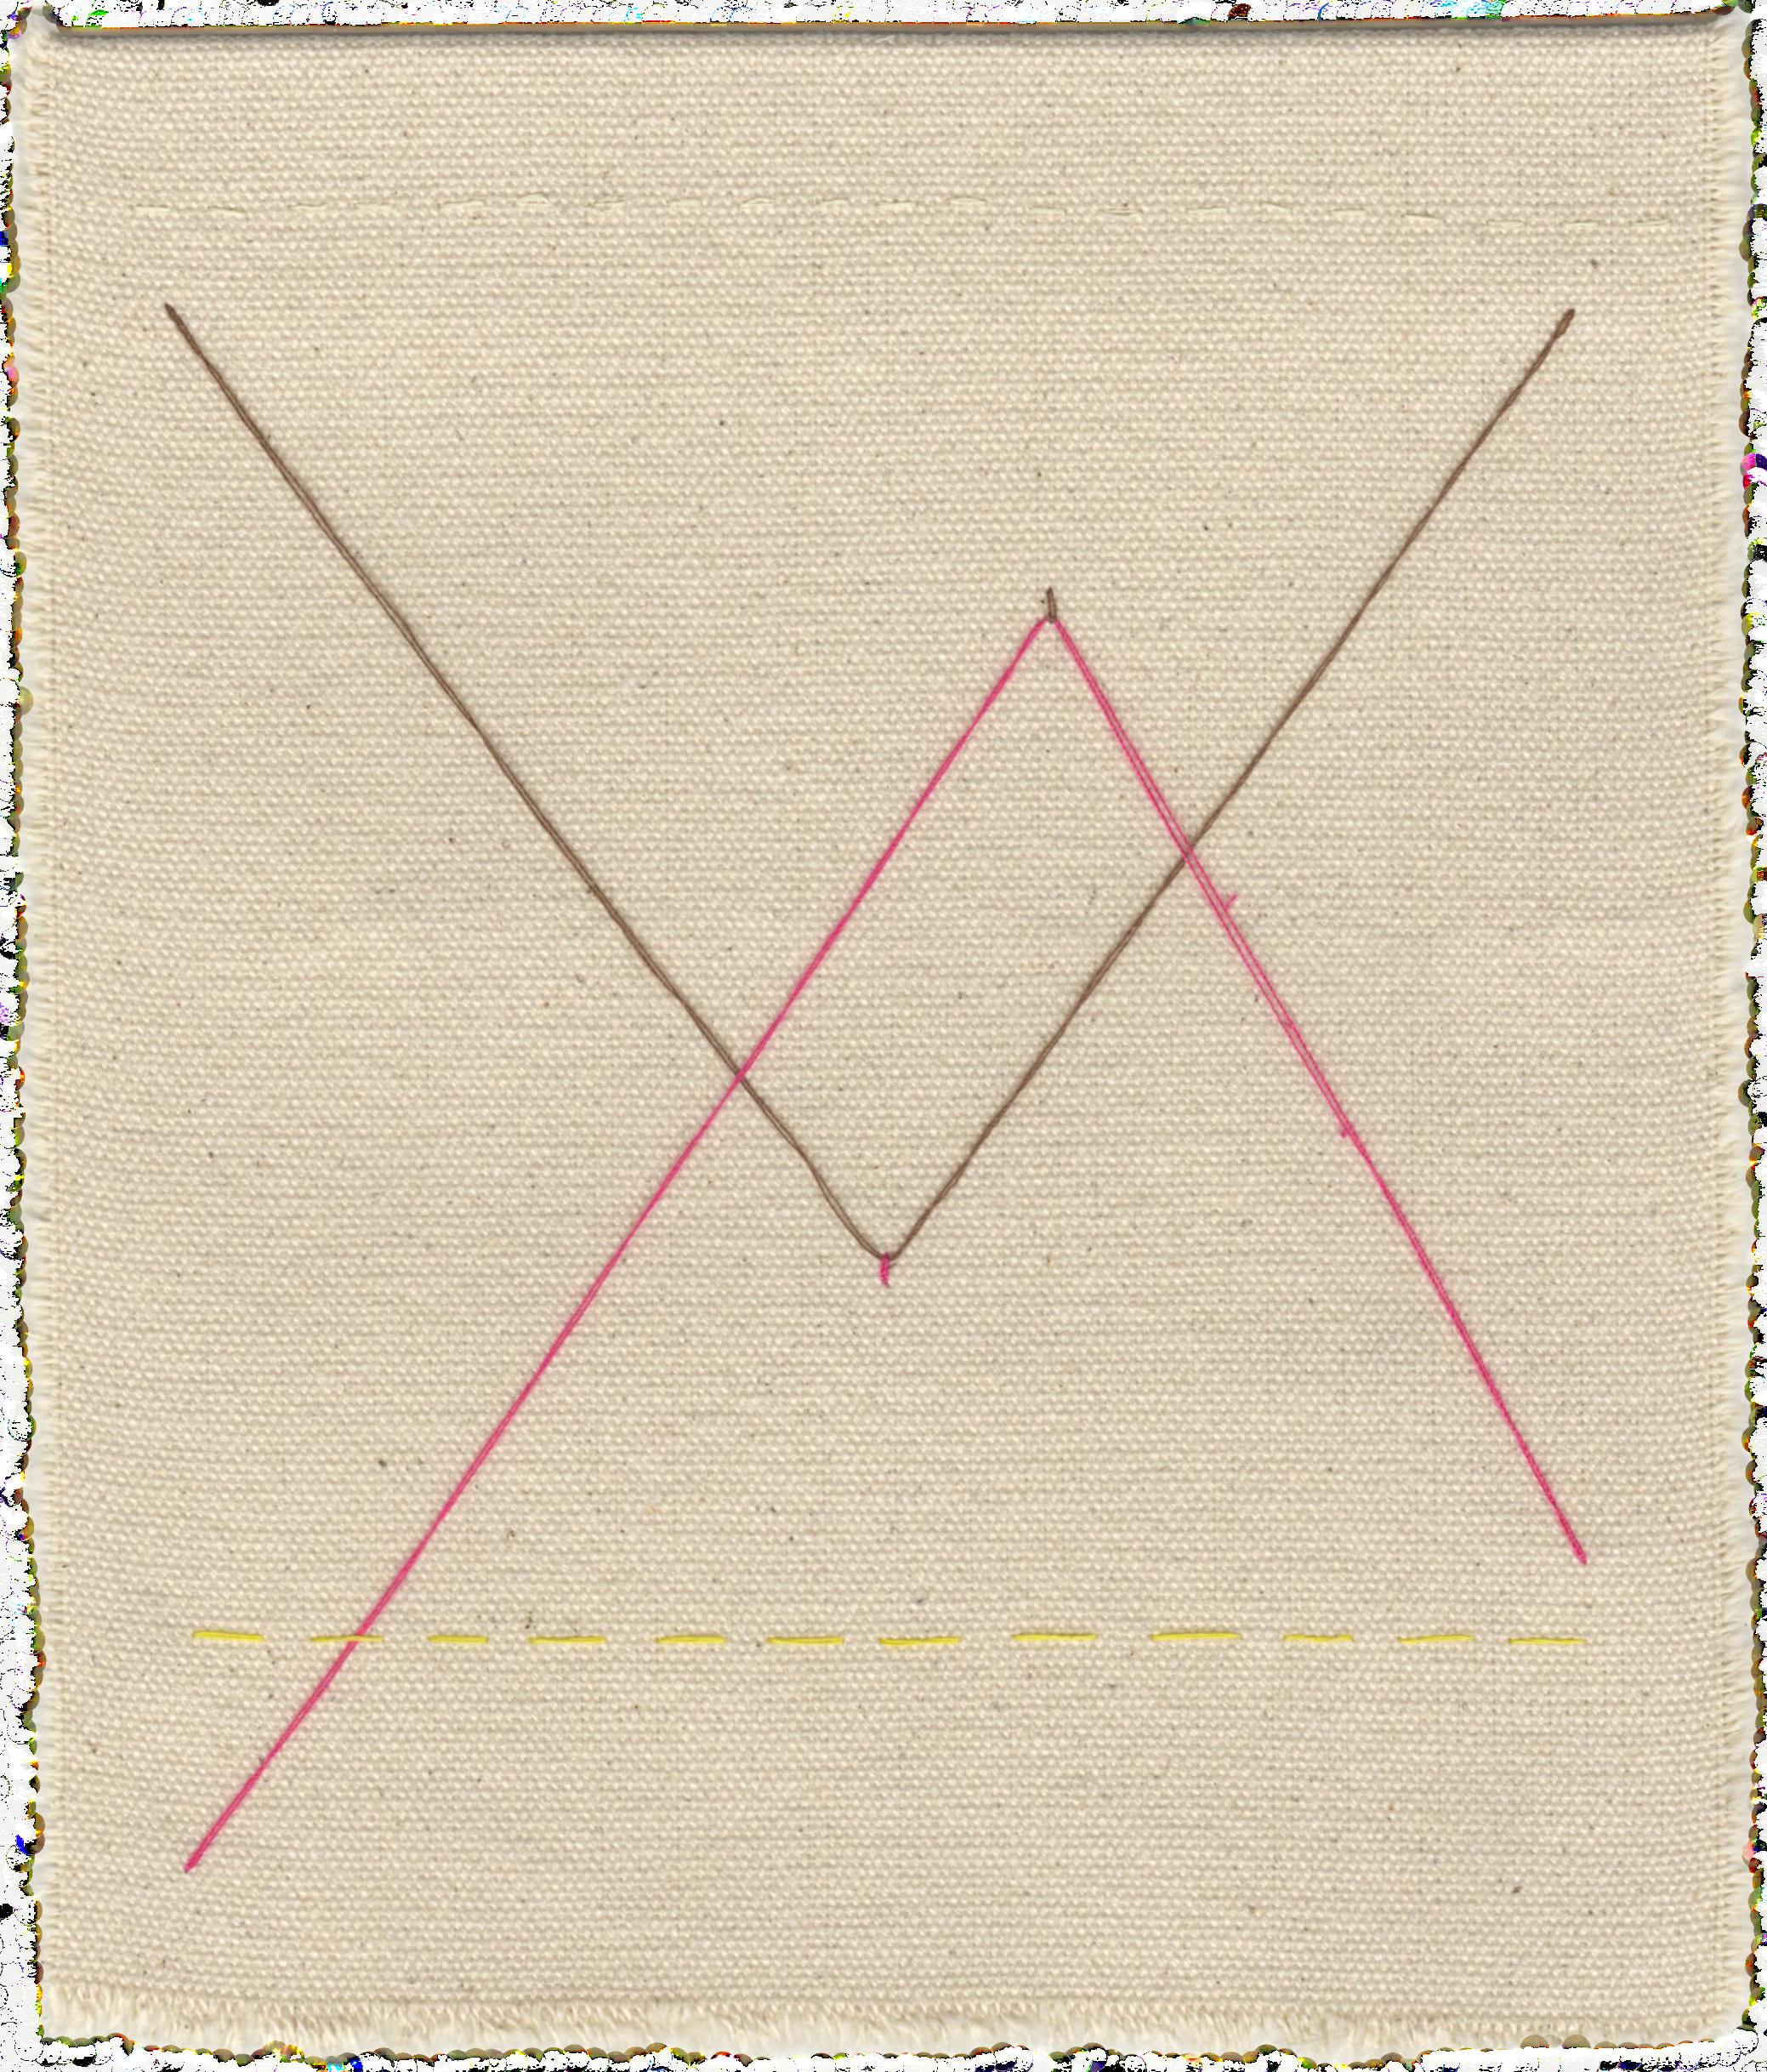 Stitch Drawing 06